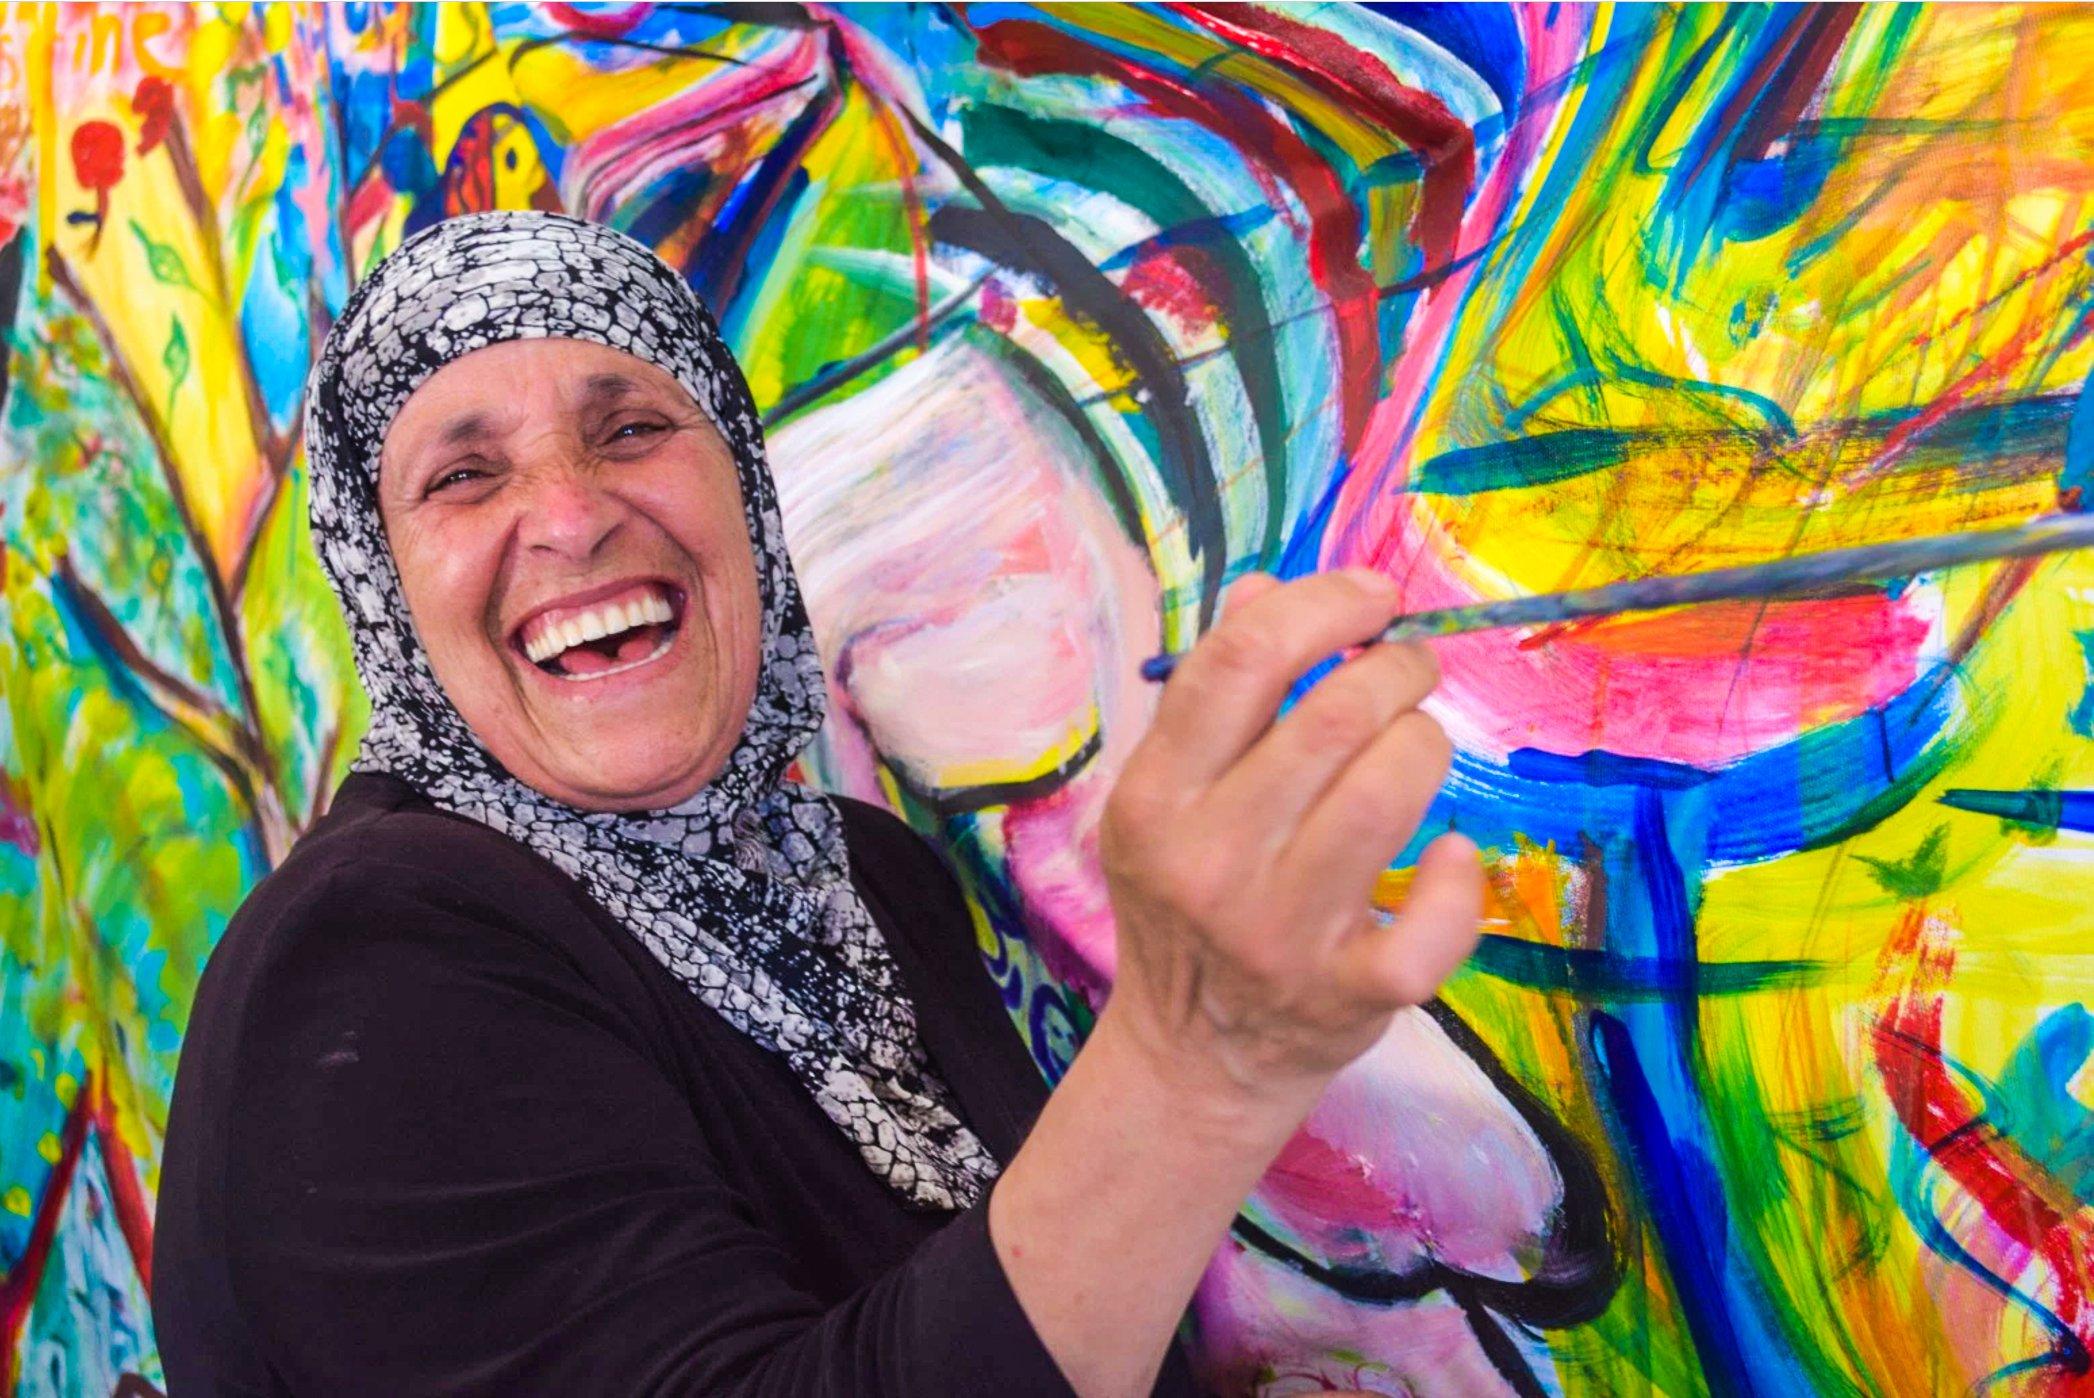 Palestinian Woman Painting Laughing.jpg